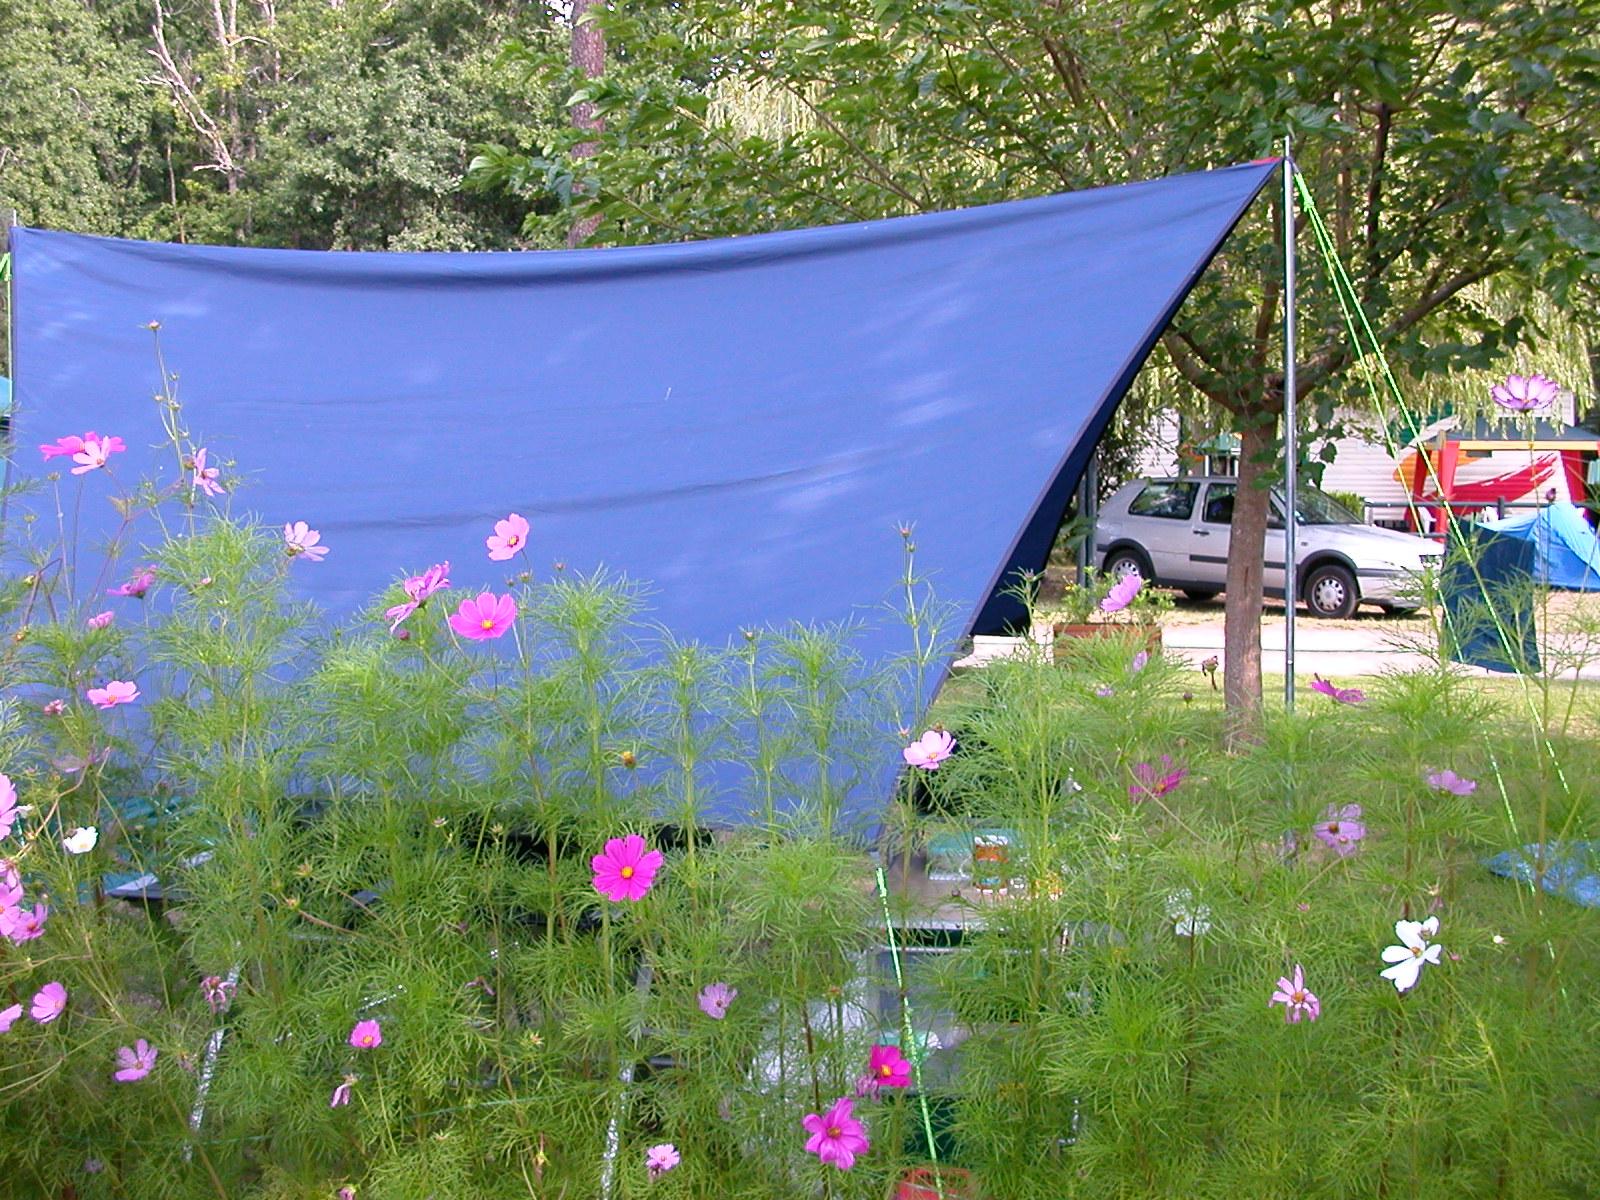 Emplacements camping bassin d 39 arcachon avec piscine - Camping bassin d arcachon avec piscine ...